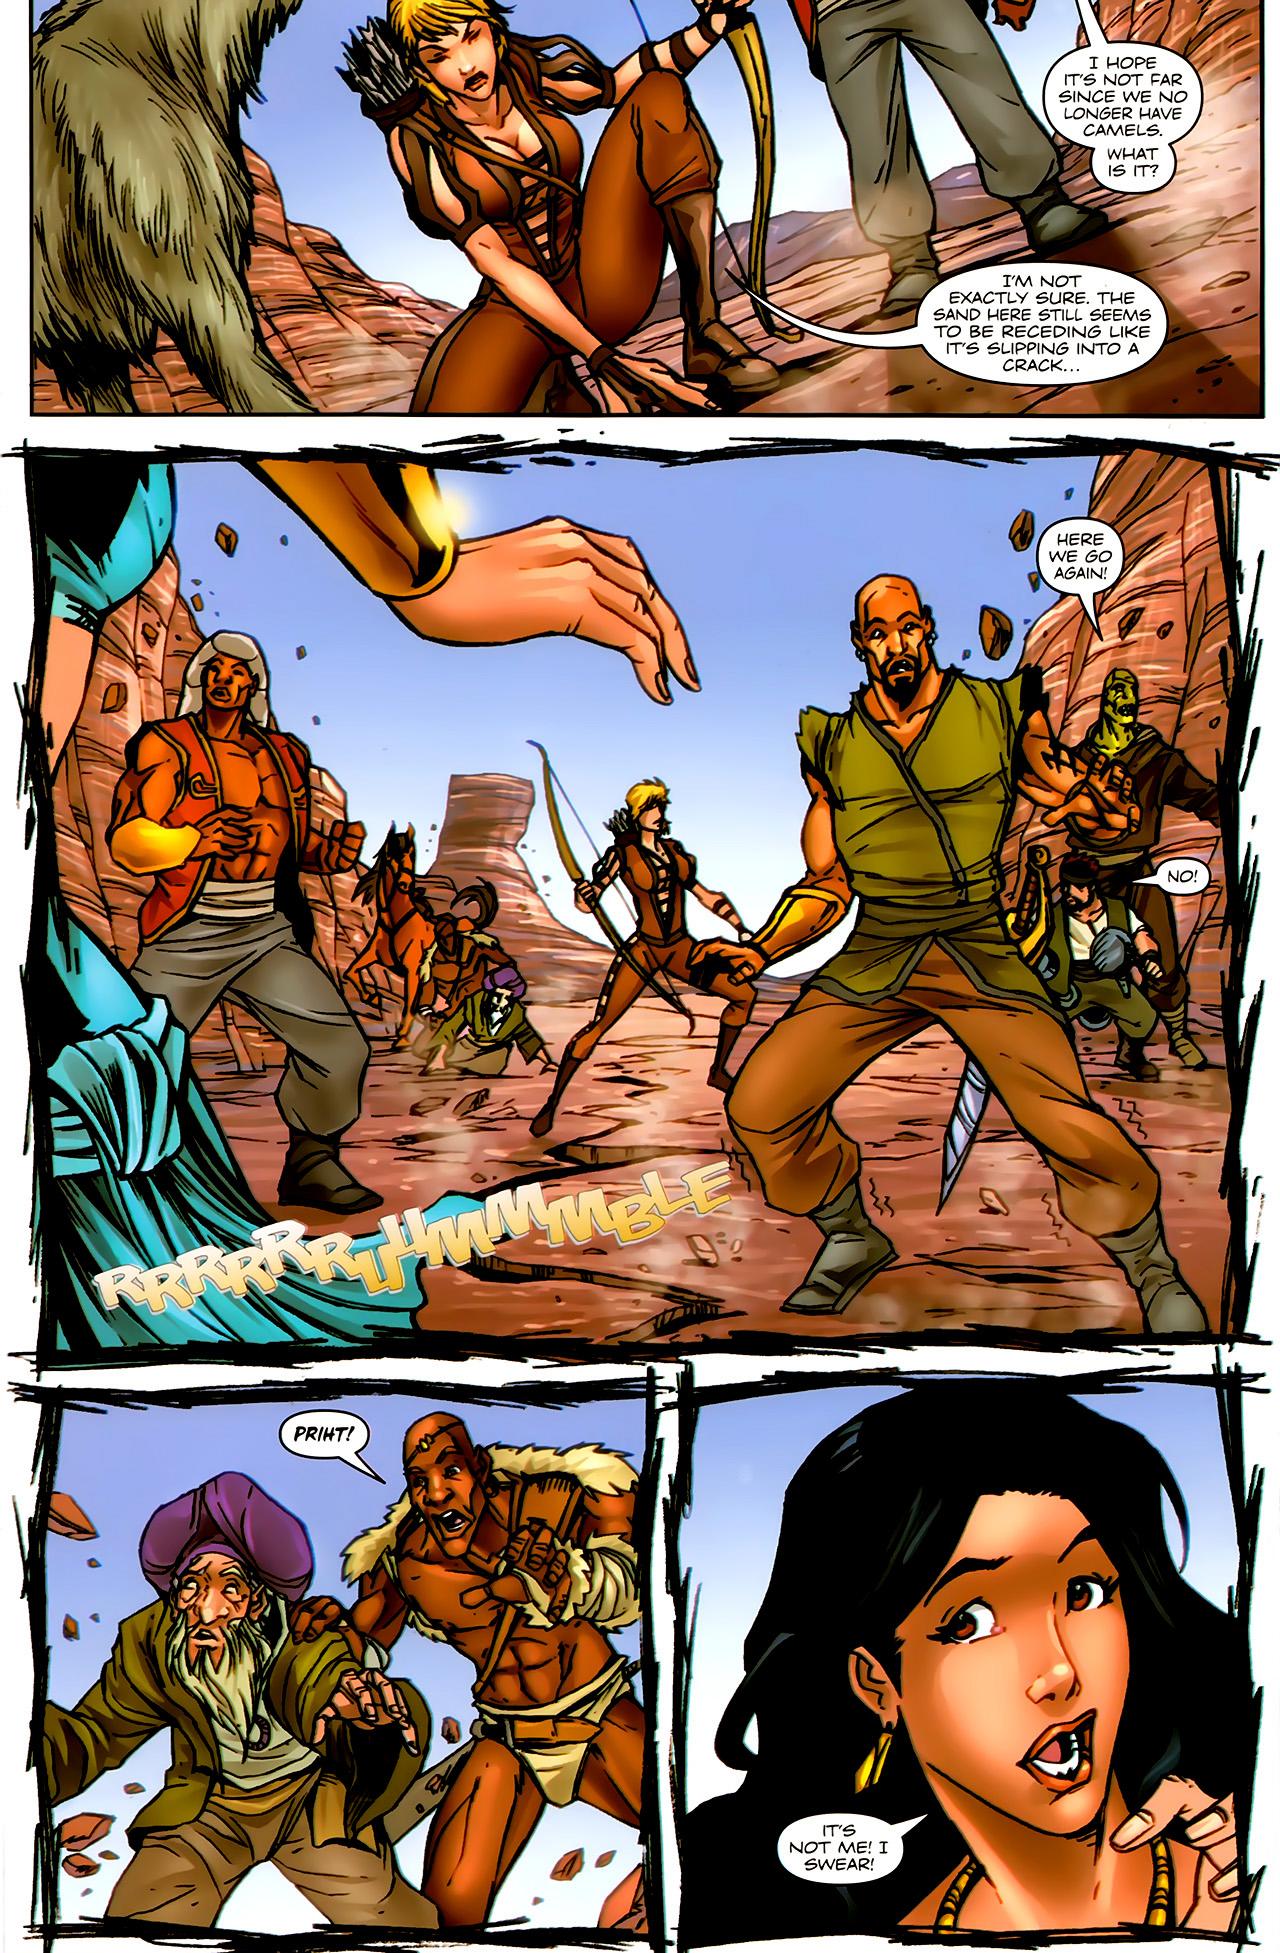 Read online 1001 Arabian Nights: The Adventures of Sinbad comic -  Issue #9 - 21